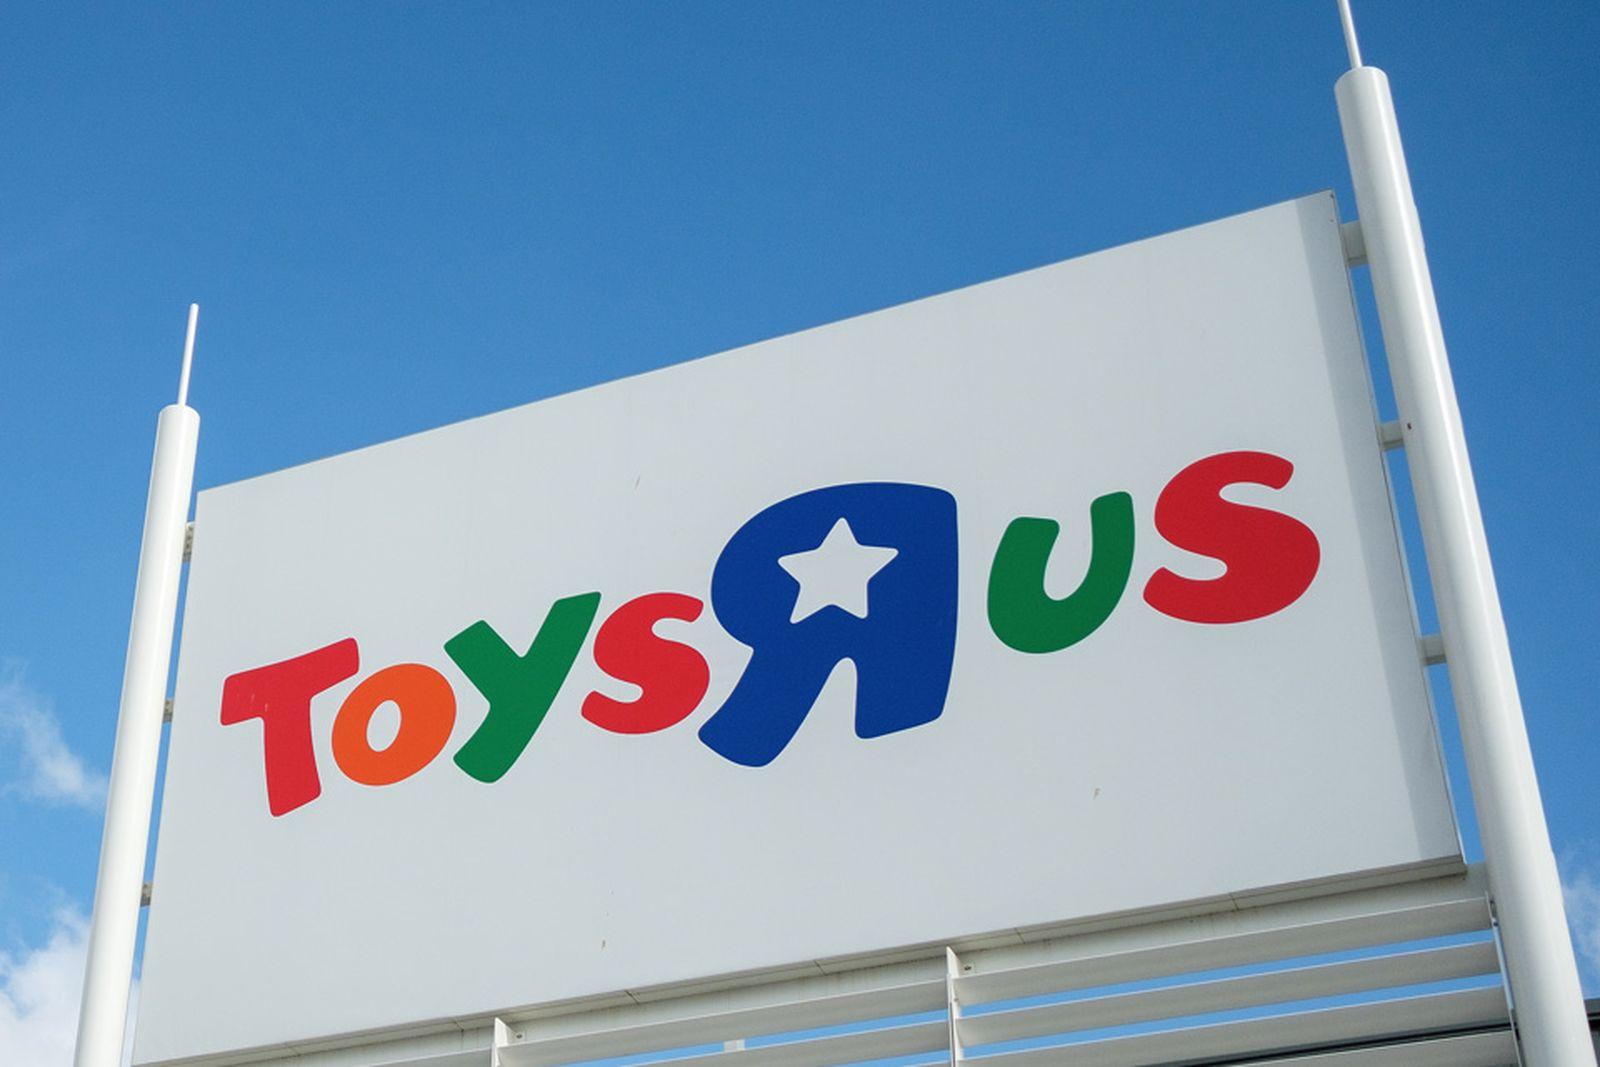 toys r us closing down announcement